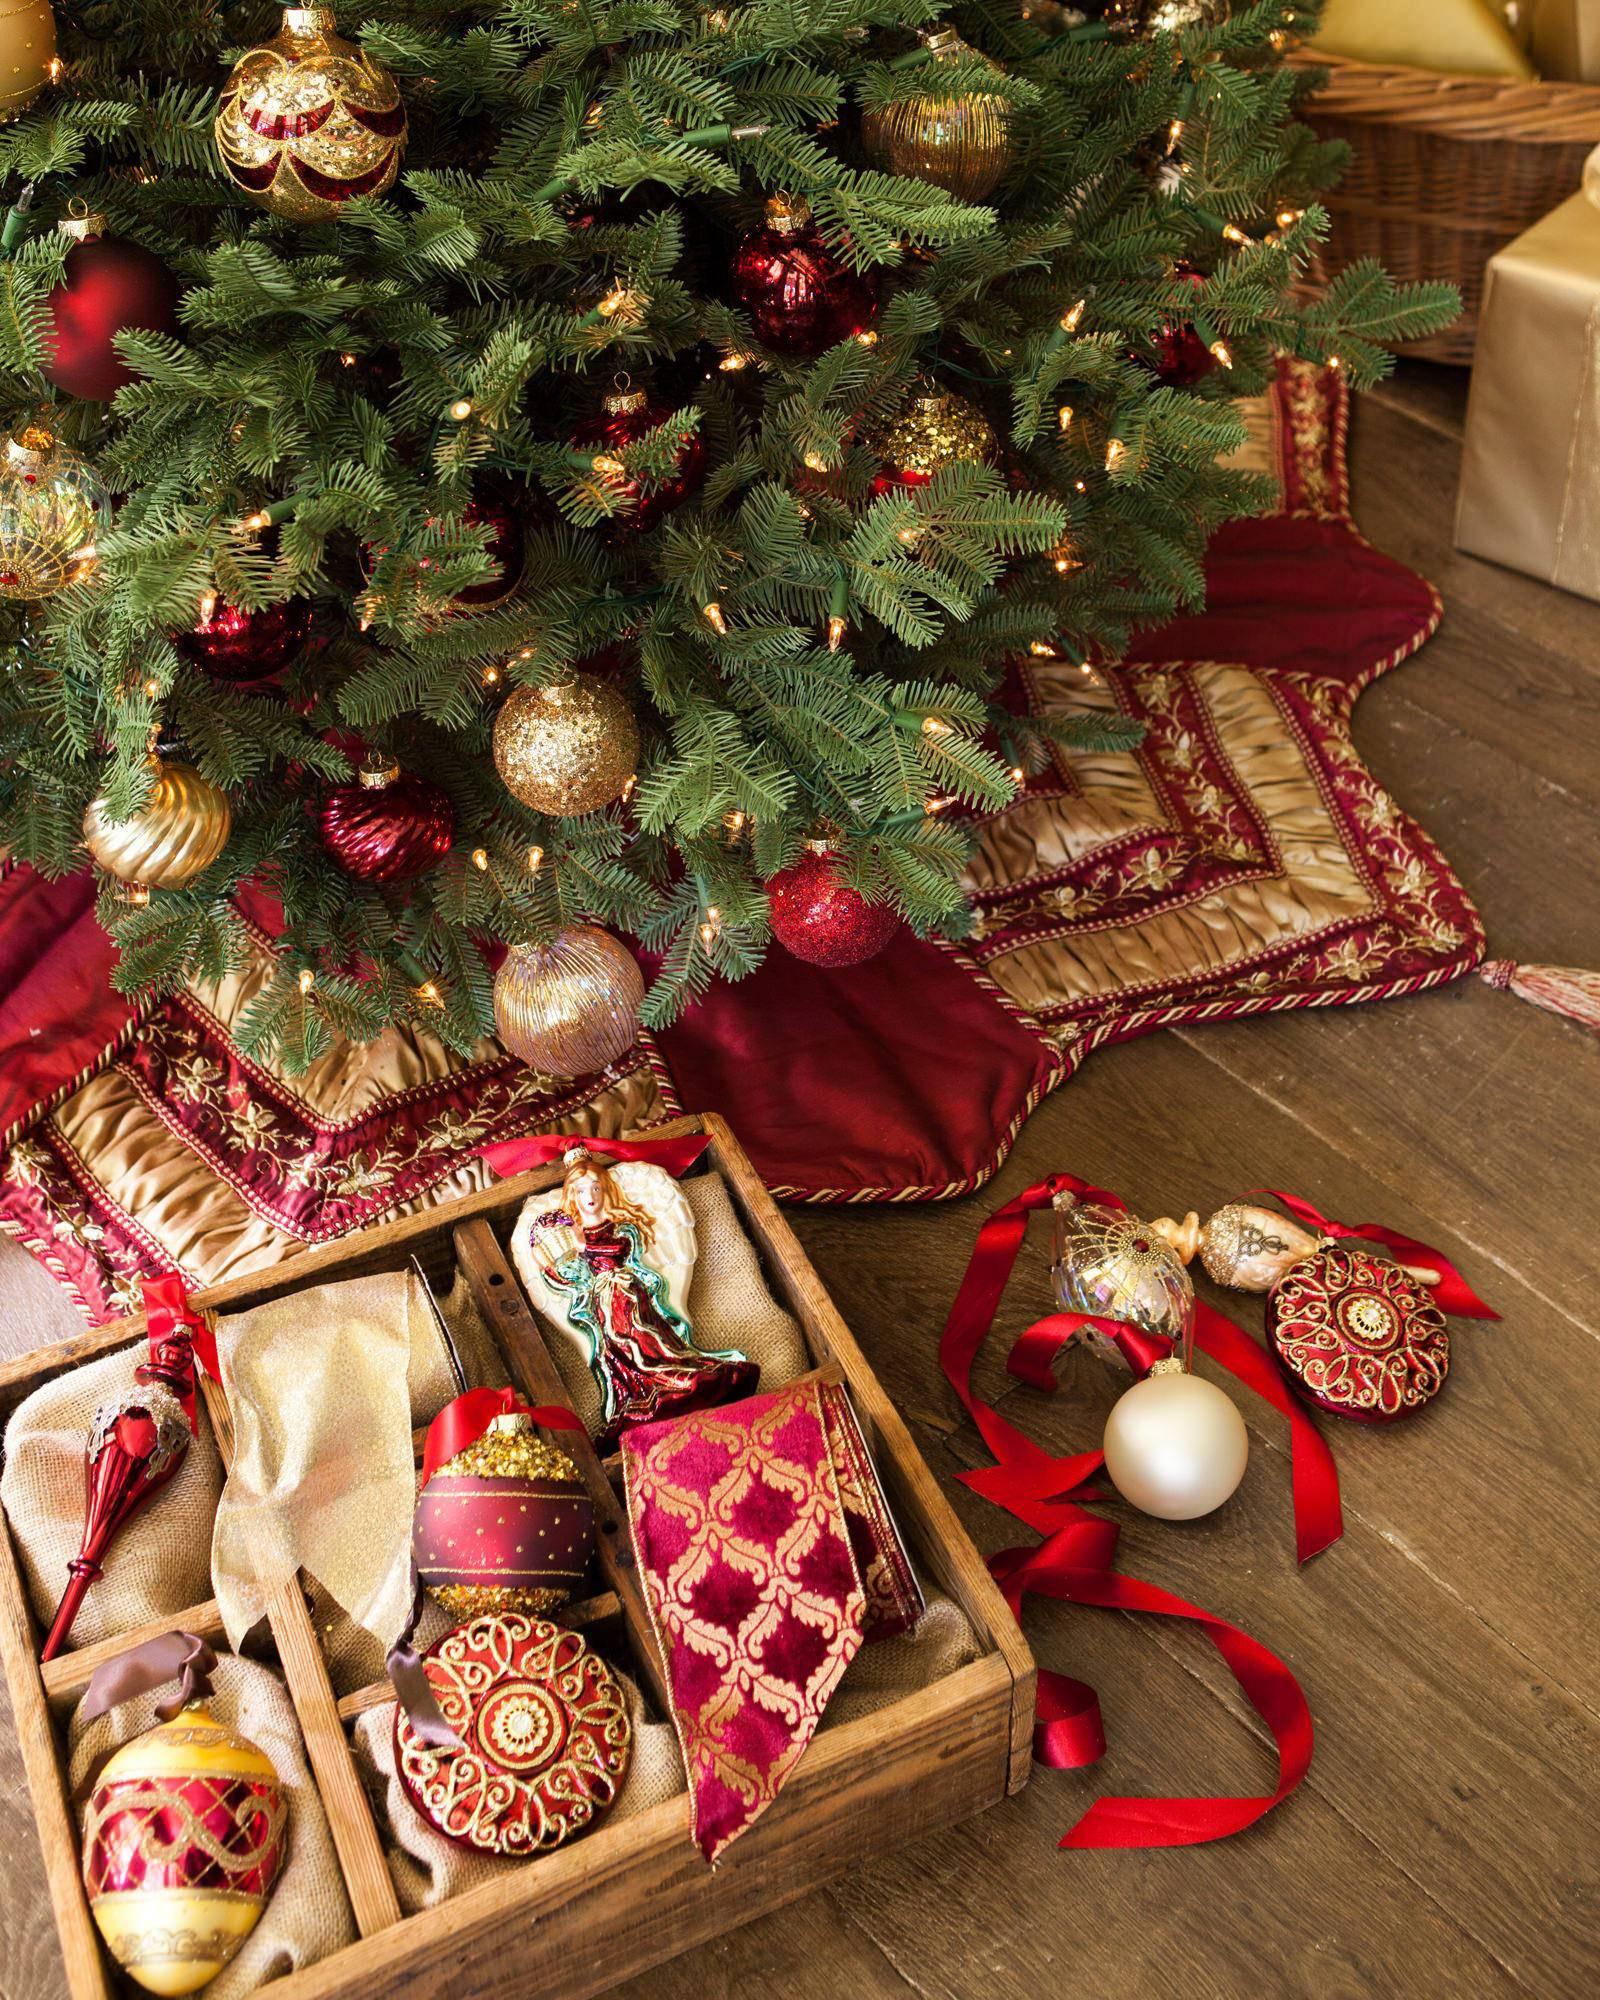 Christmas tree ornaments sets -  Ornament Set 35 Pieces Alt Alt Alt